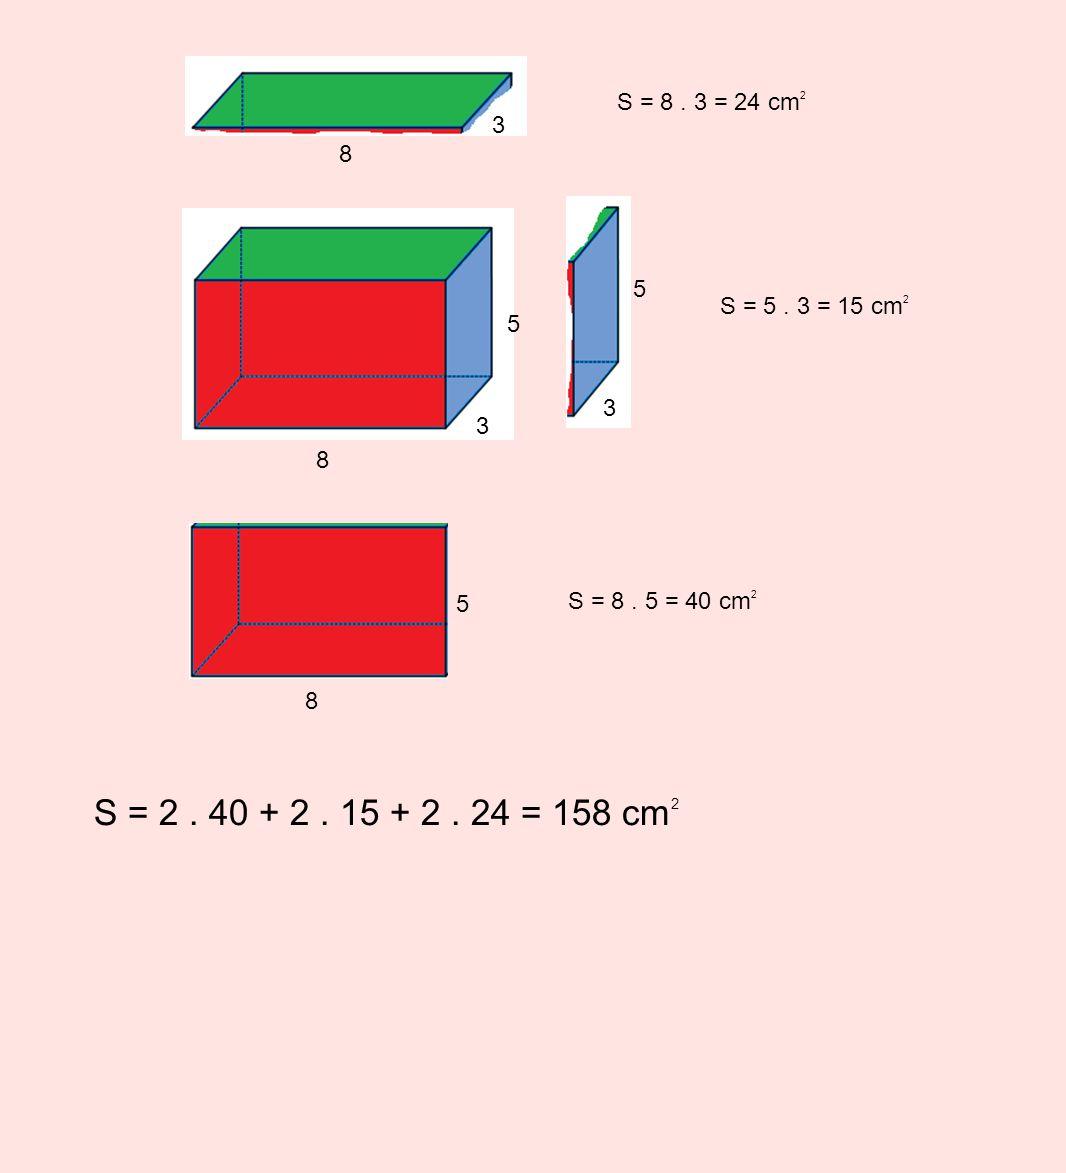 5 3 8 S = 8.5 = 40 cm 2 5 8 S = 5. 3 = 15 cm 2 5 3 S = 8.